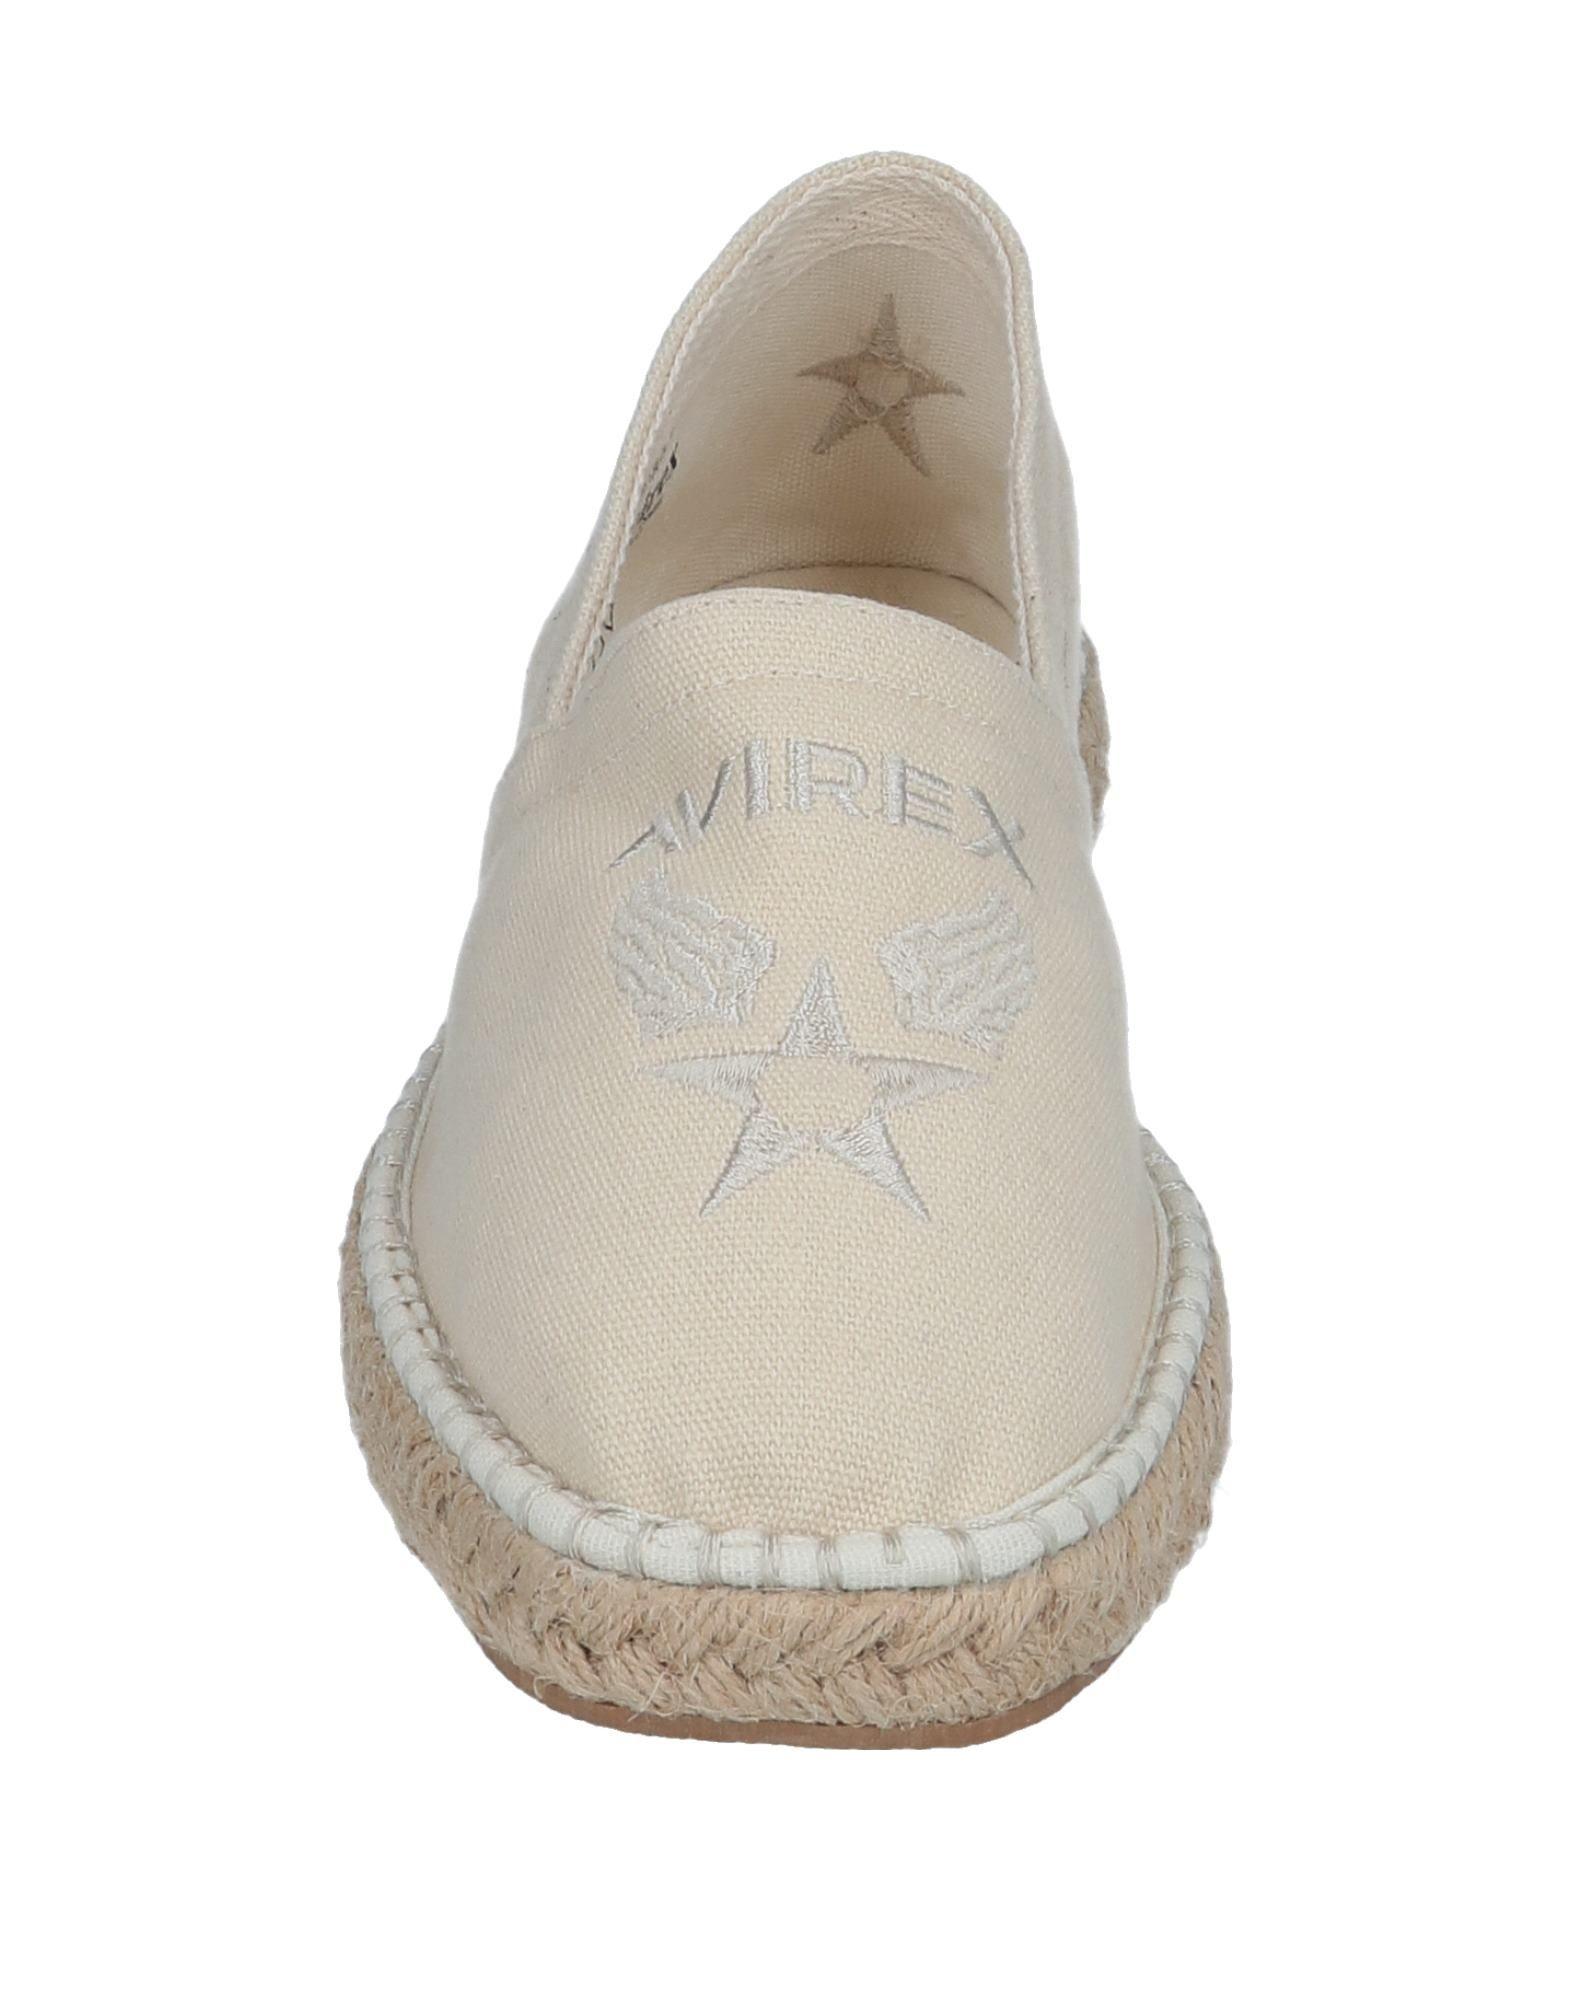 Rabatt Rabatt Rabatt echte Schuhe Avirex Espadrilles Herren  11549976ER 3c5a3a